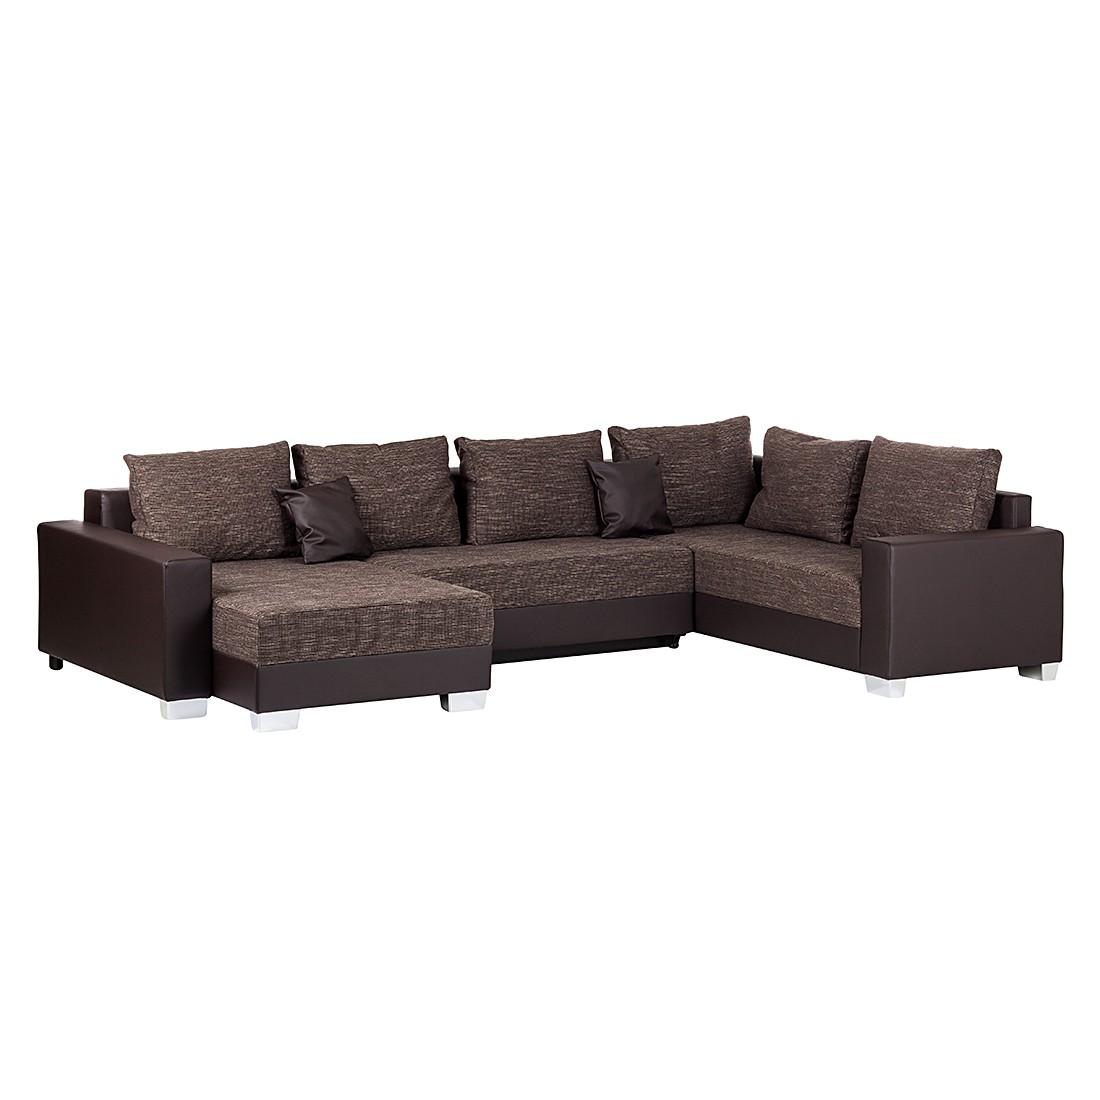 canapes modulables convertibles tissu hornet comparer les prix et promo. Black Bedroom Furniture Sets. Home Design Ideas